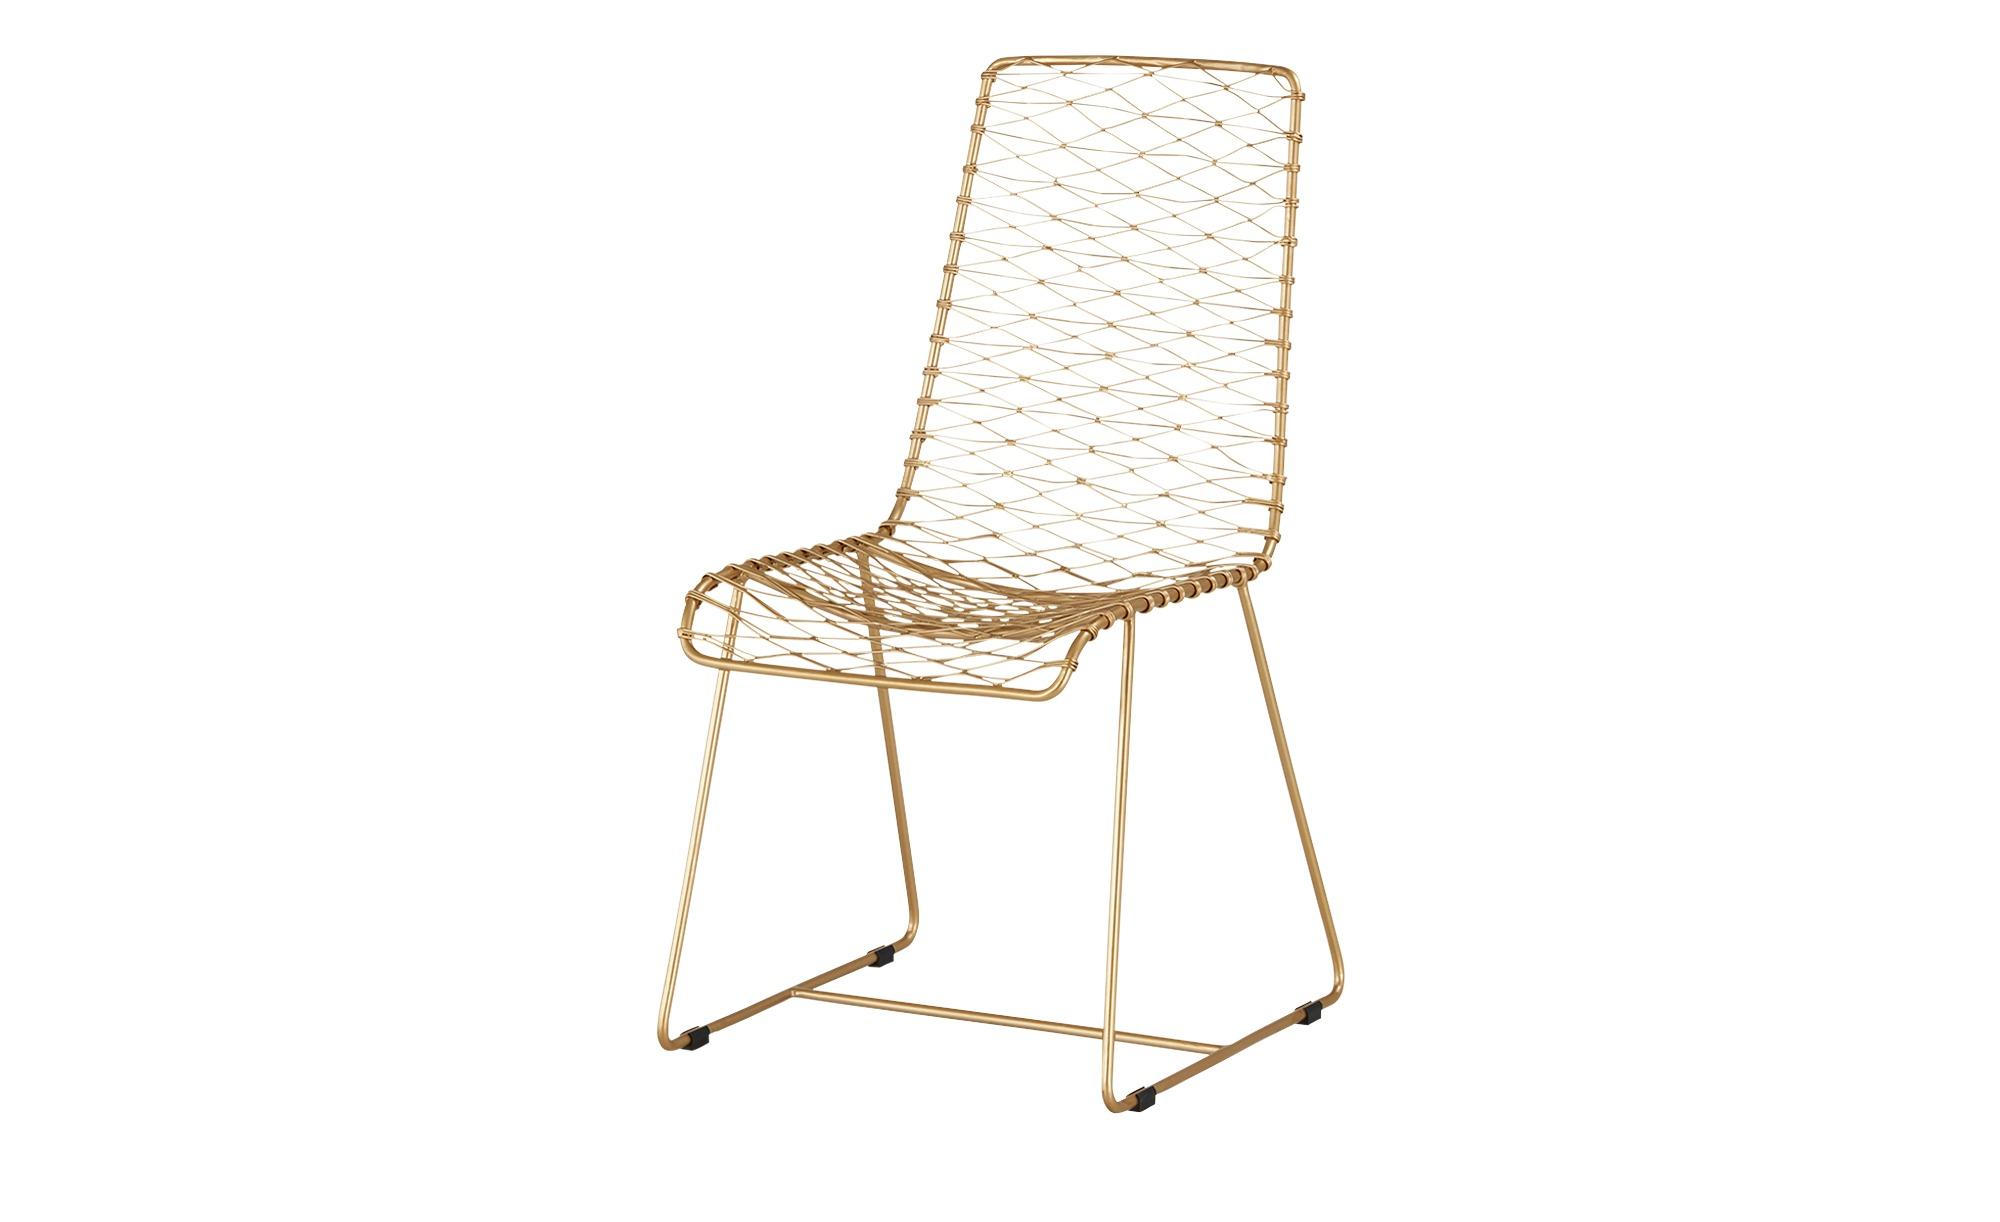 Stuhl mit filigranem Geflecht